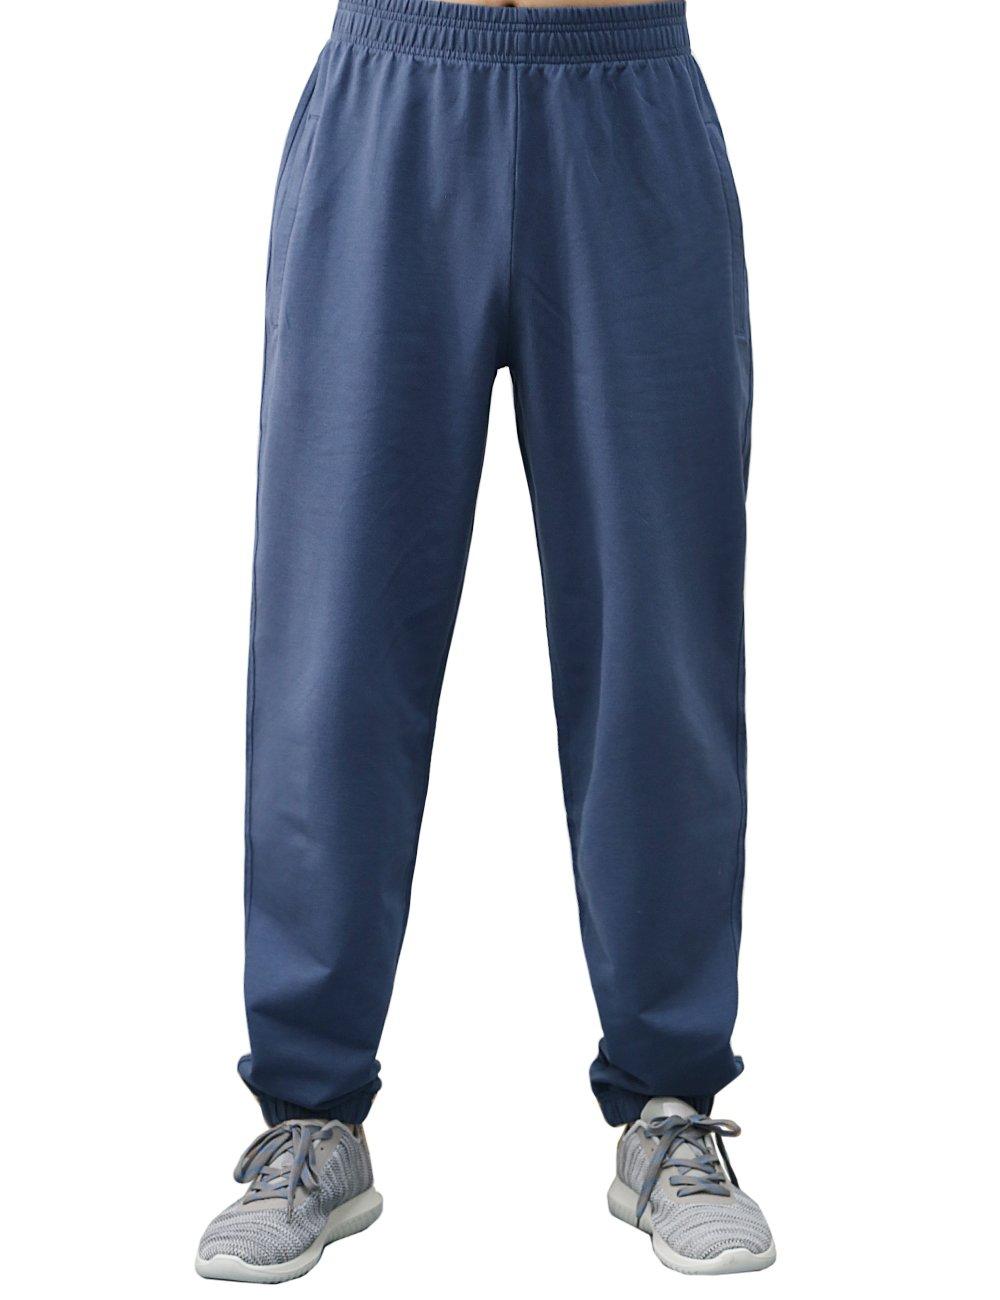 BONWAY Men's Sweatpants Active Pants Jersey Athletic Cotton Sport Pants with Pockets Heavy Sweatpants by BONWAY (Image #1)